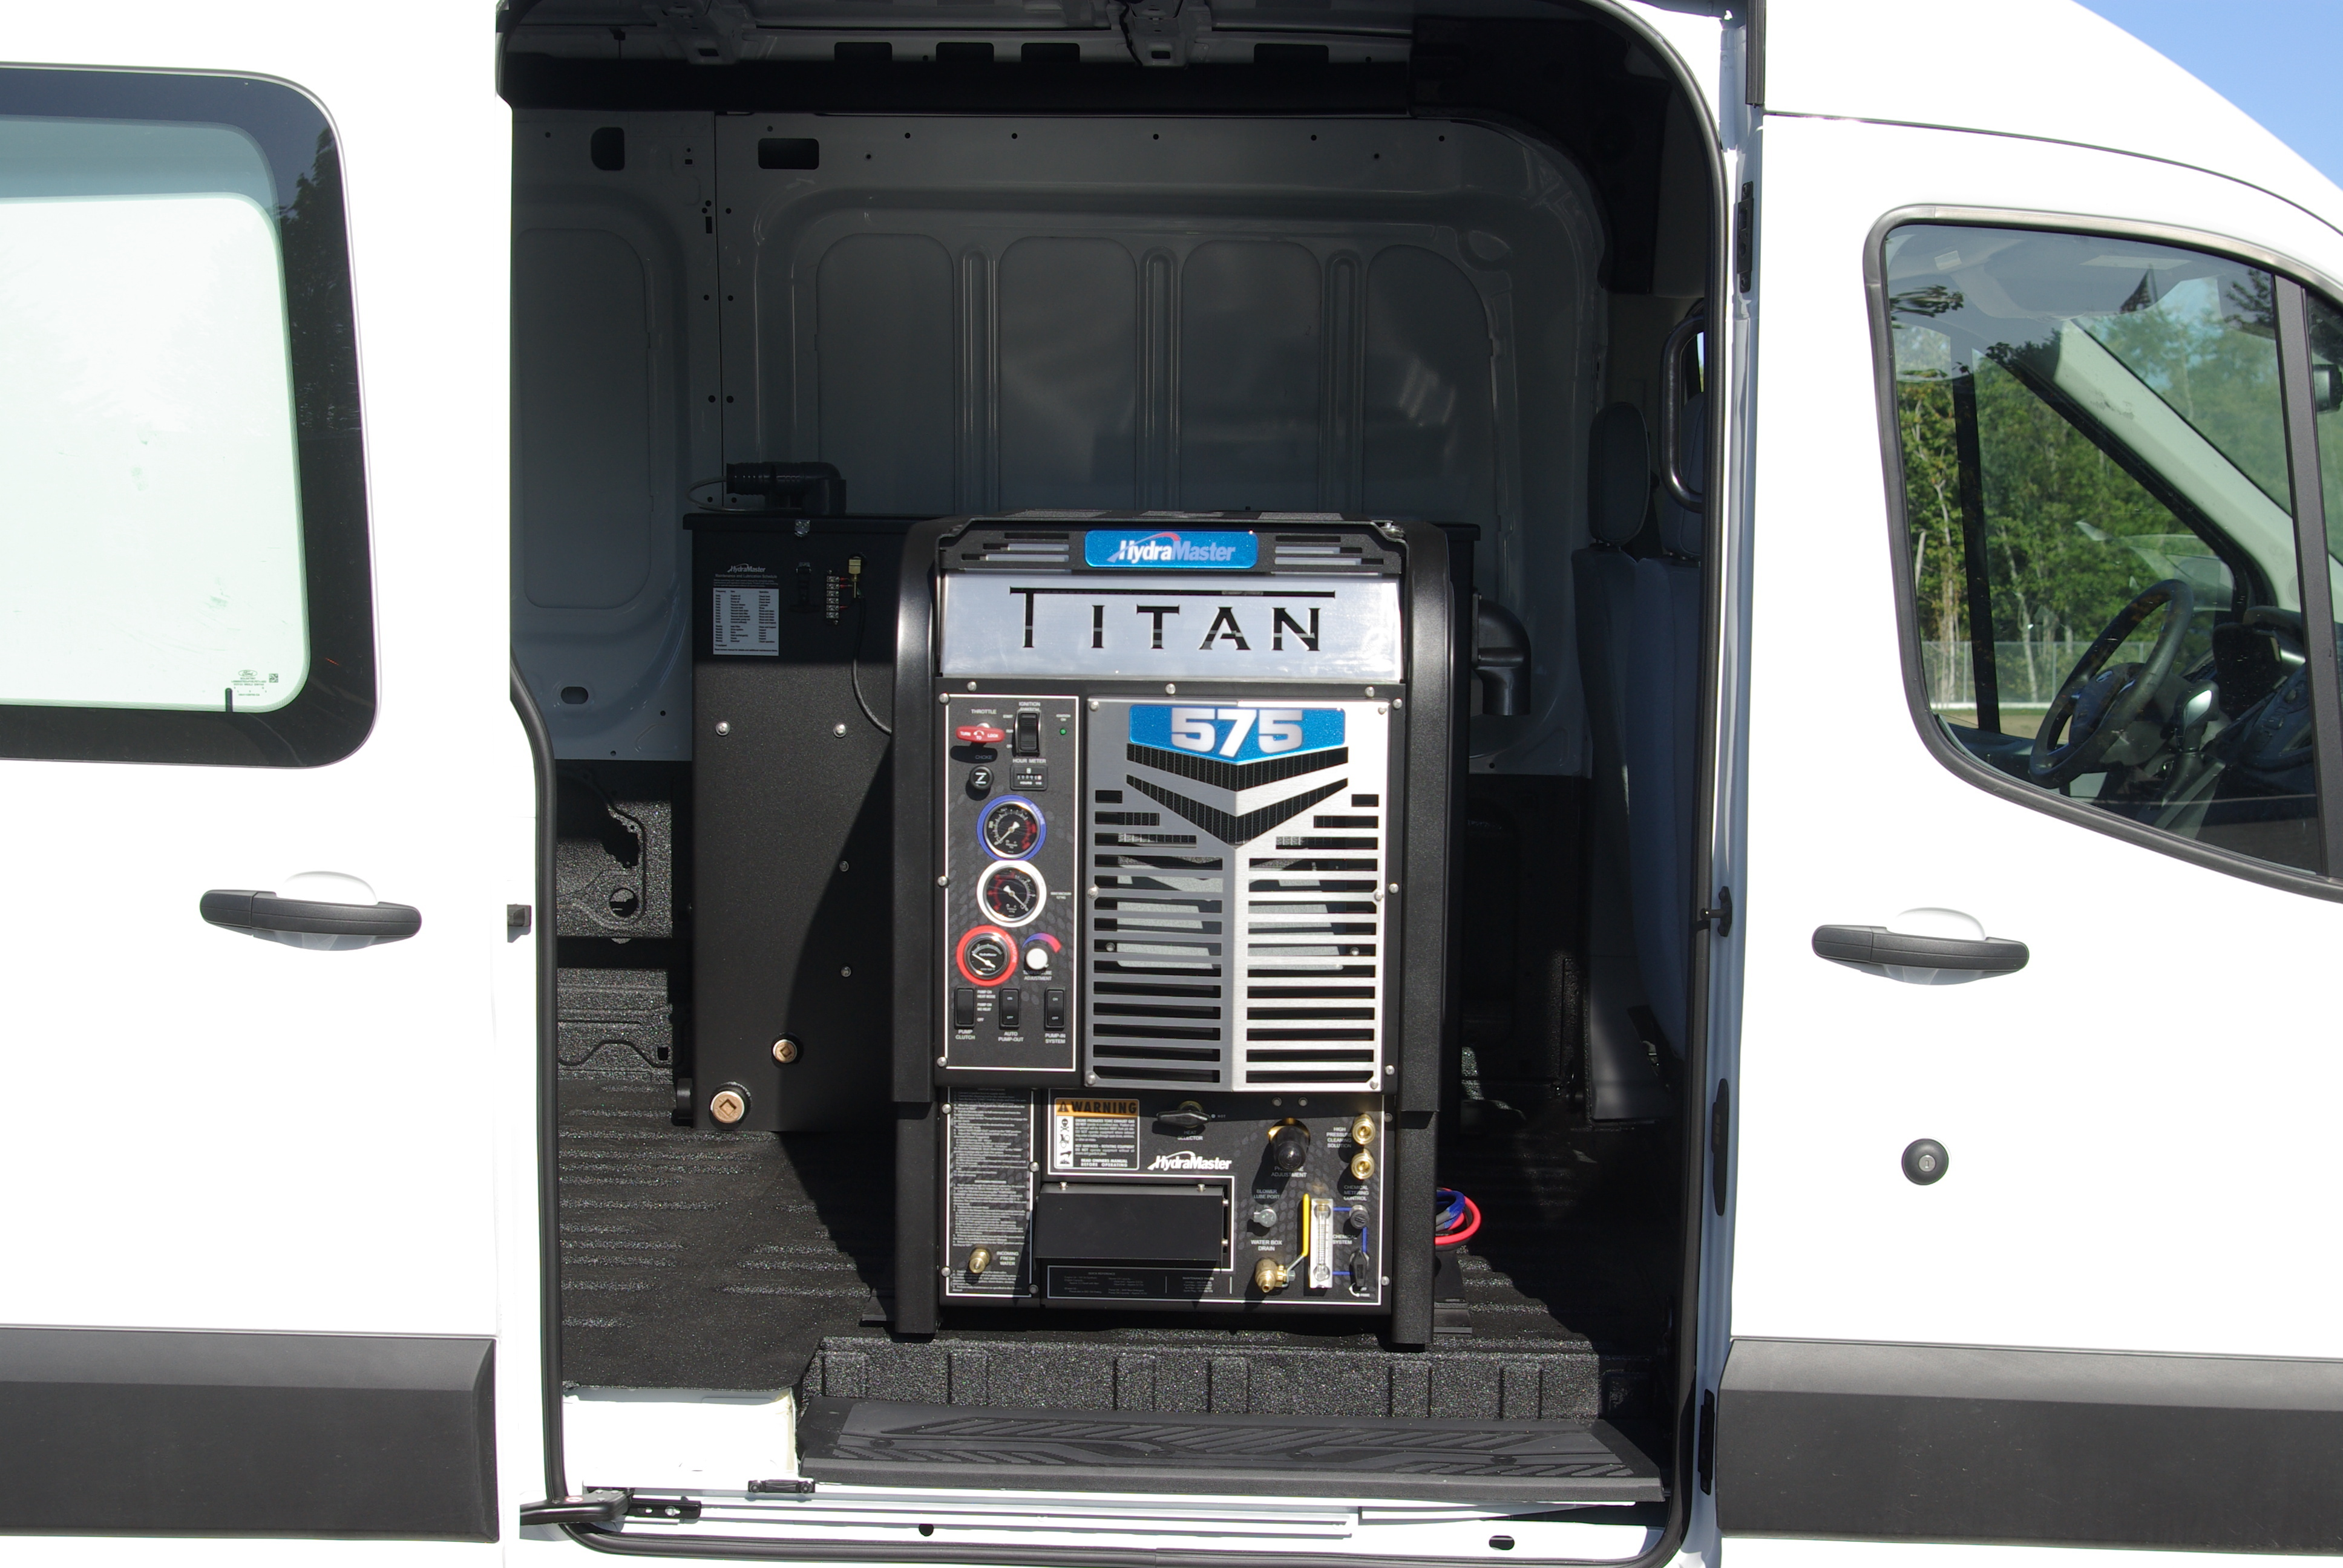 HydraMaster Titan 575 Truckmount w/100 Gal. Tank